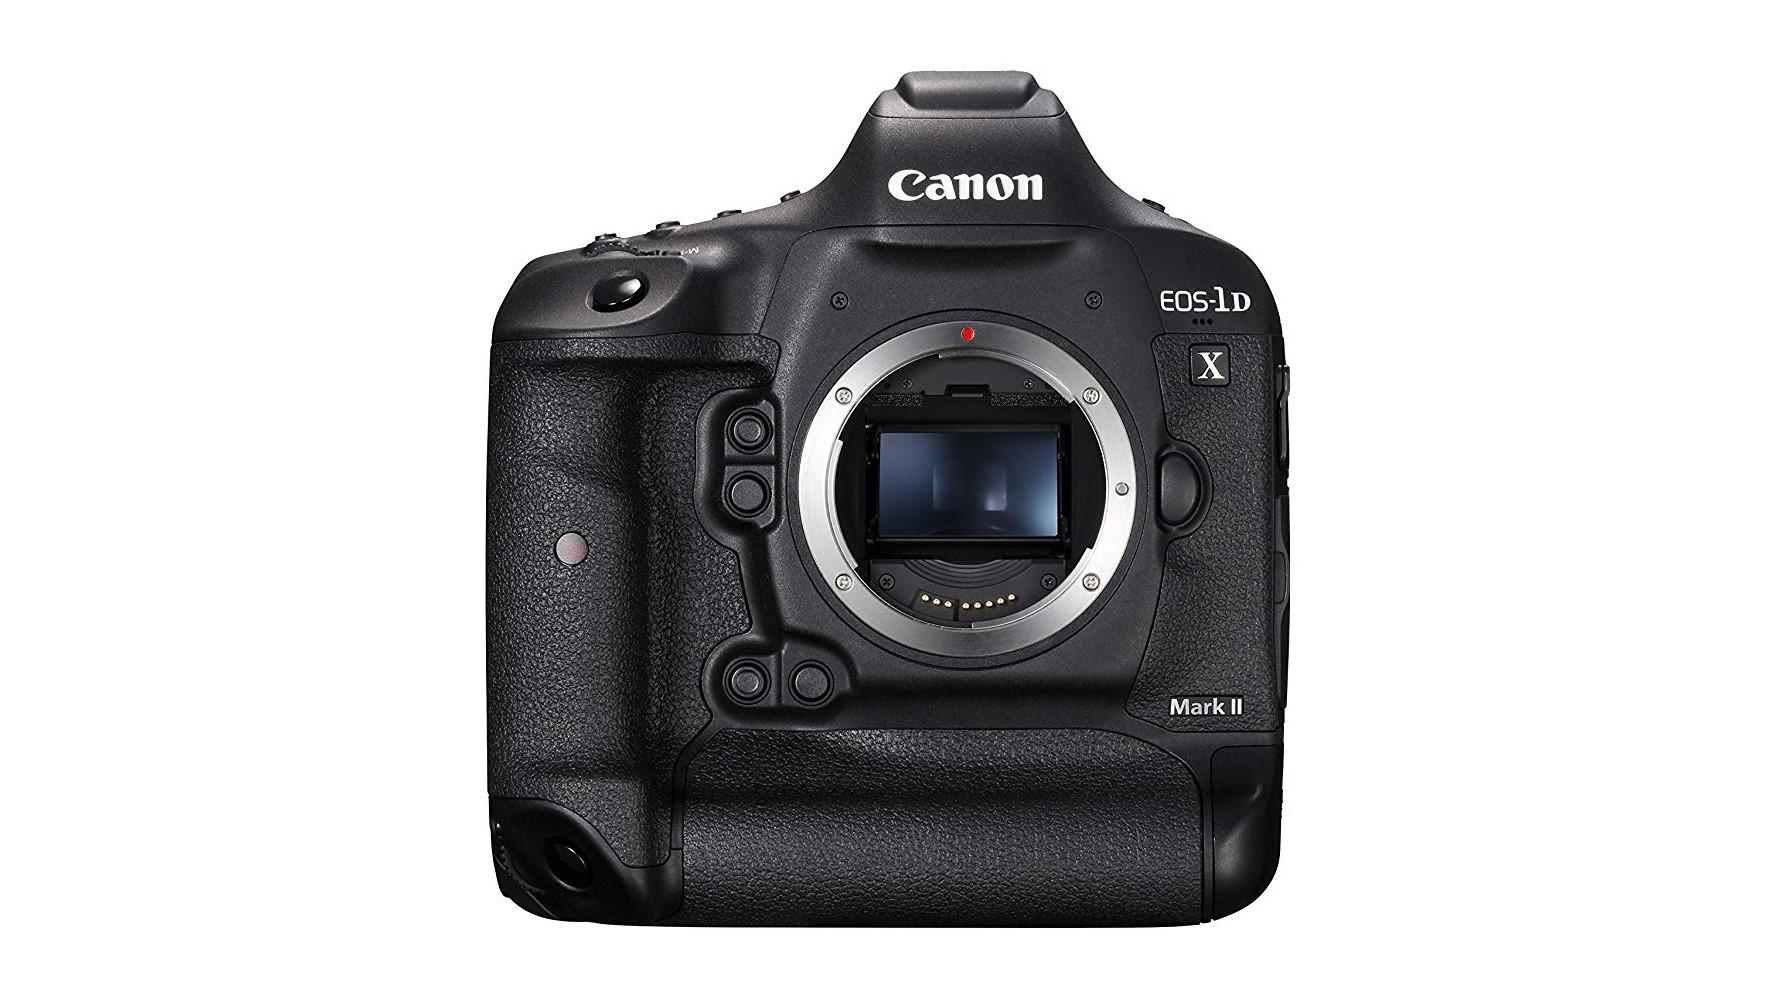 Canon EOS 1DX Mark II DSLR camera body